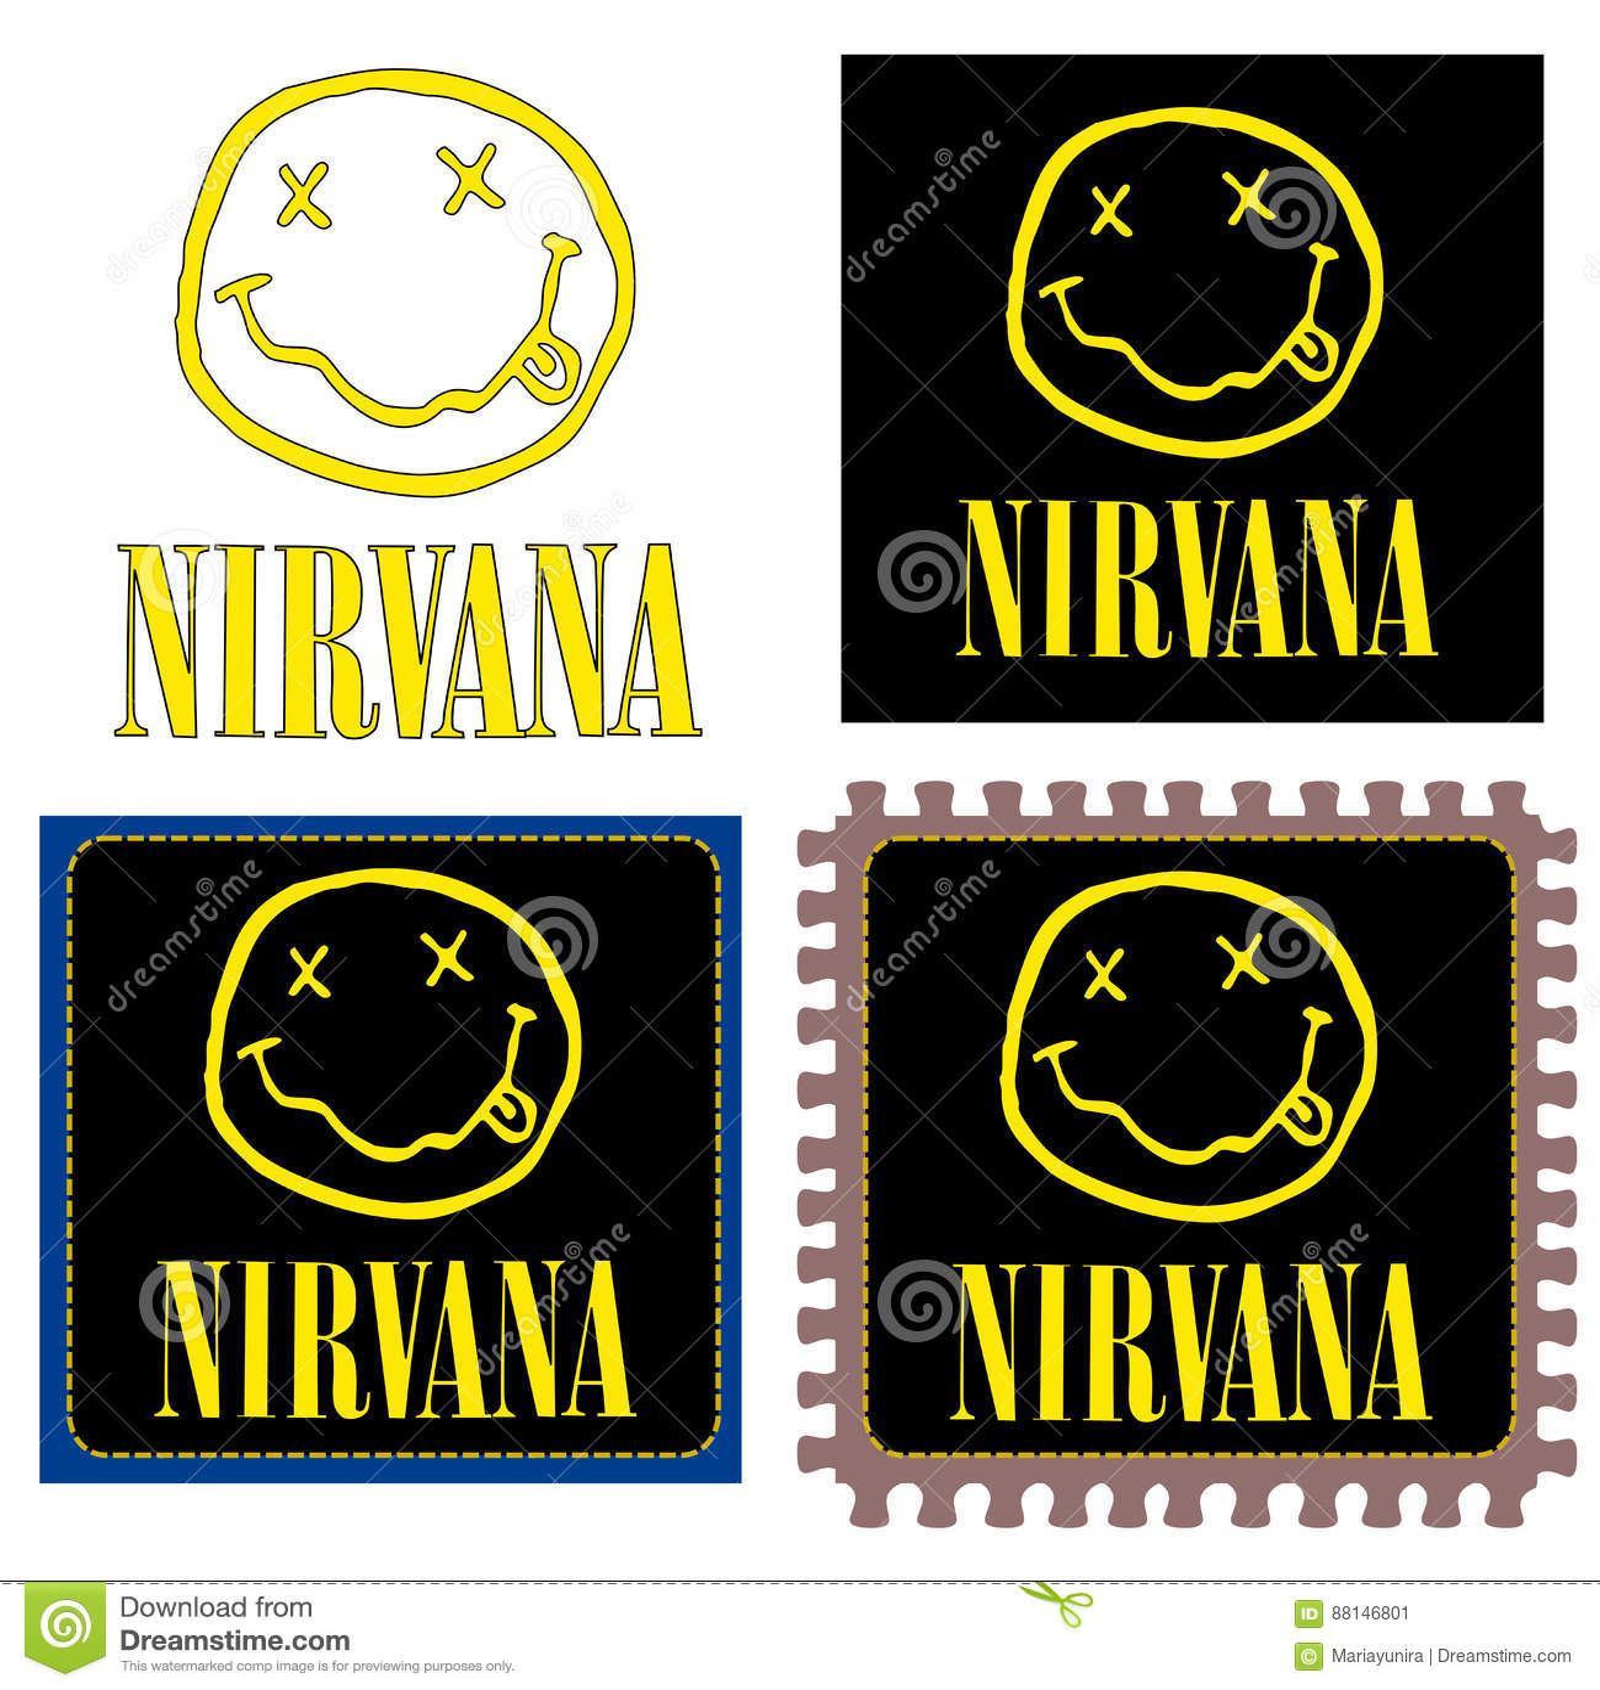 Nirvana stock illustrations 1177 nirvana stock illustrations nirvana stock illustrations 1177 nirvana stock illustrations vectors clipart dreamstime biocorpaavc Images